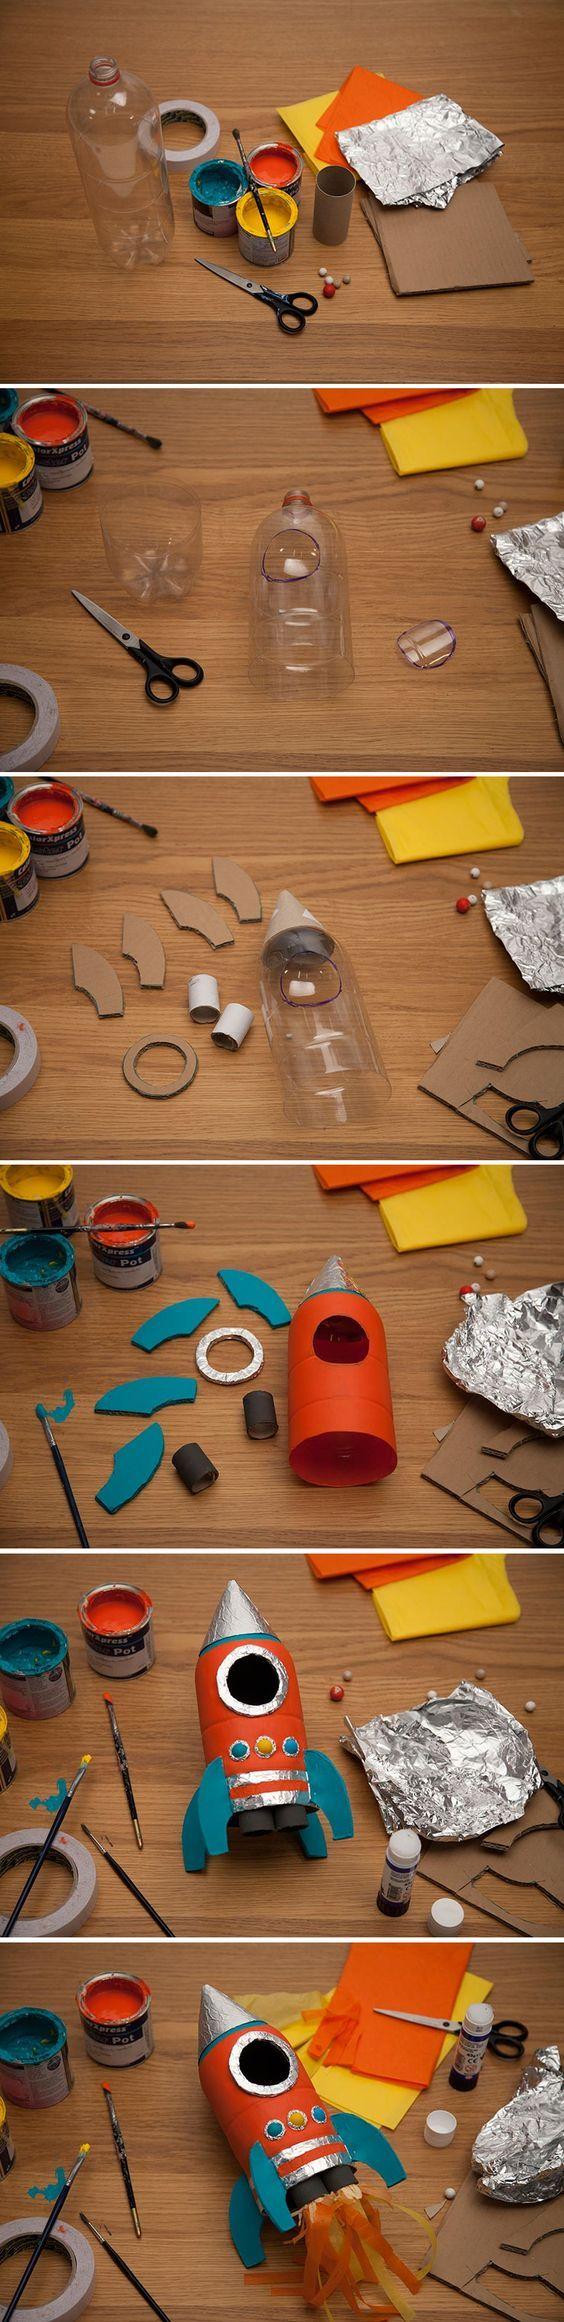 Nave espacio con materiais reciclables